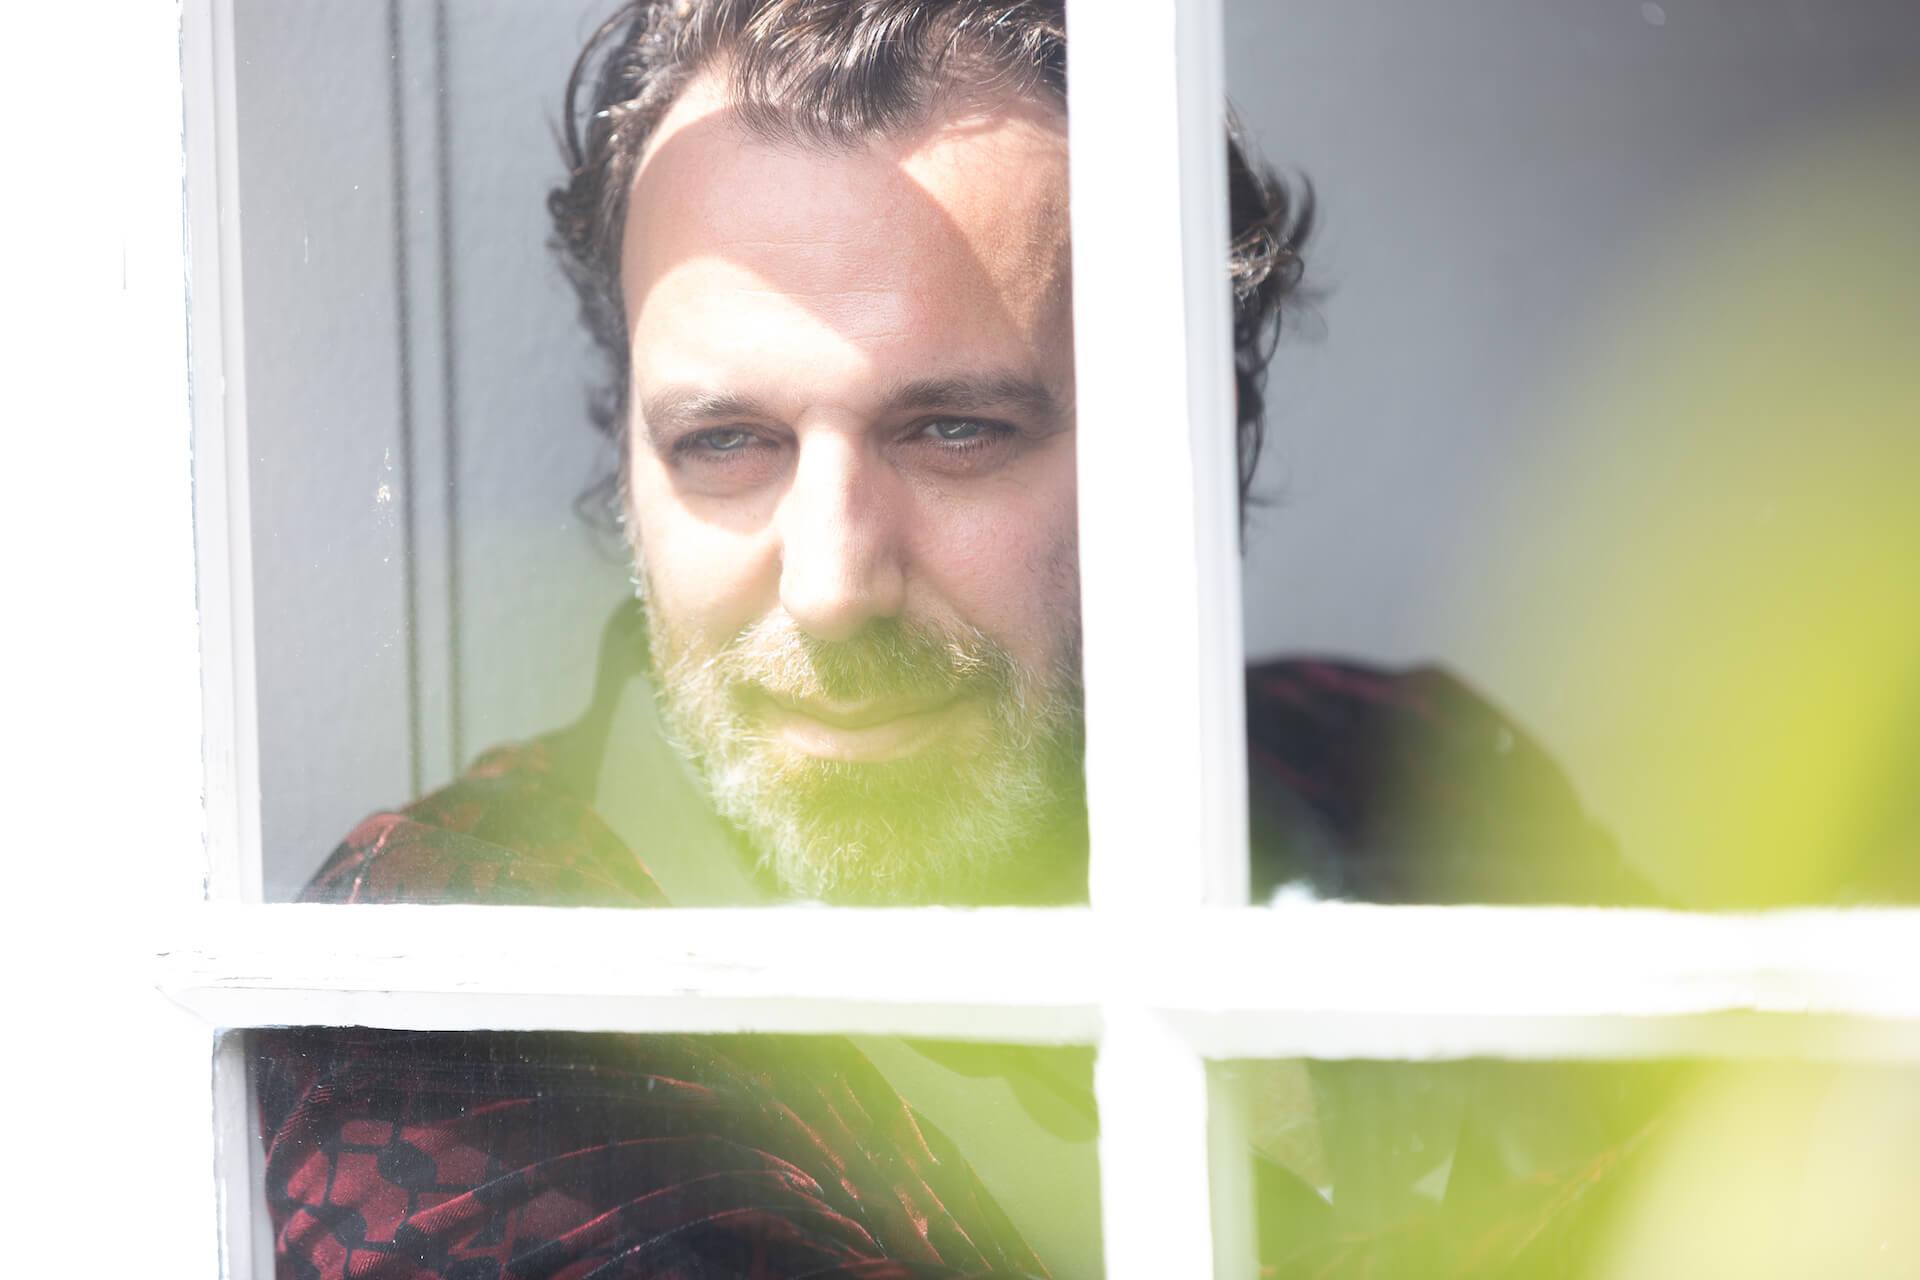 Chilly Gonzalesがクリスマス・アルバム『A very chilly christmas』リリース記念にスペシャルライブ配信を開催!クリスマス・ミックステープもリリース music20124_chillygonzales_averychilly-christmas_7